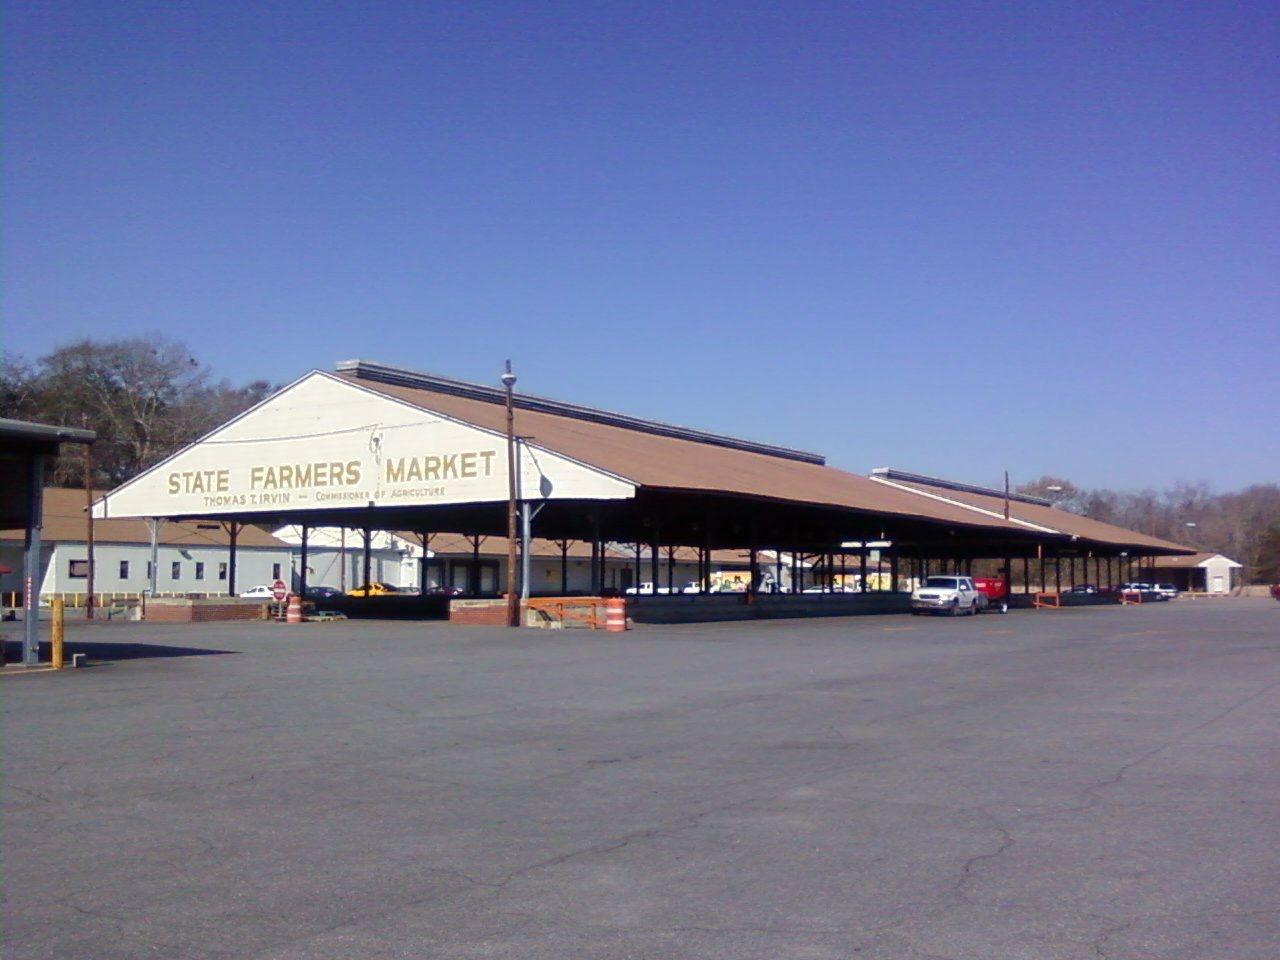 Savannah_State_Farmers_Market